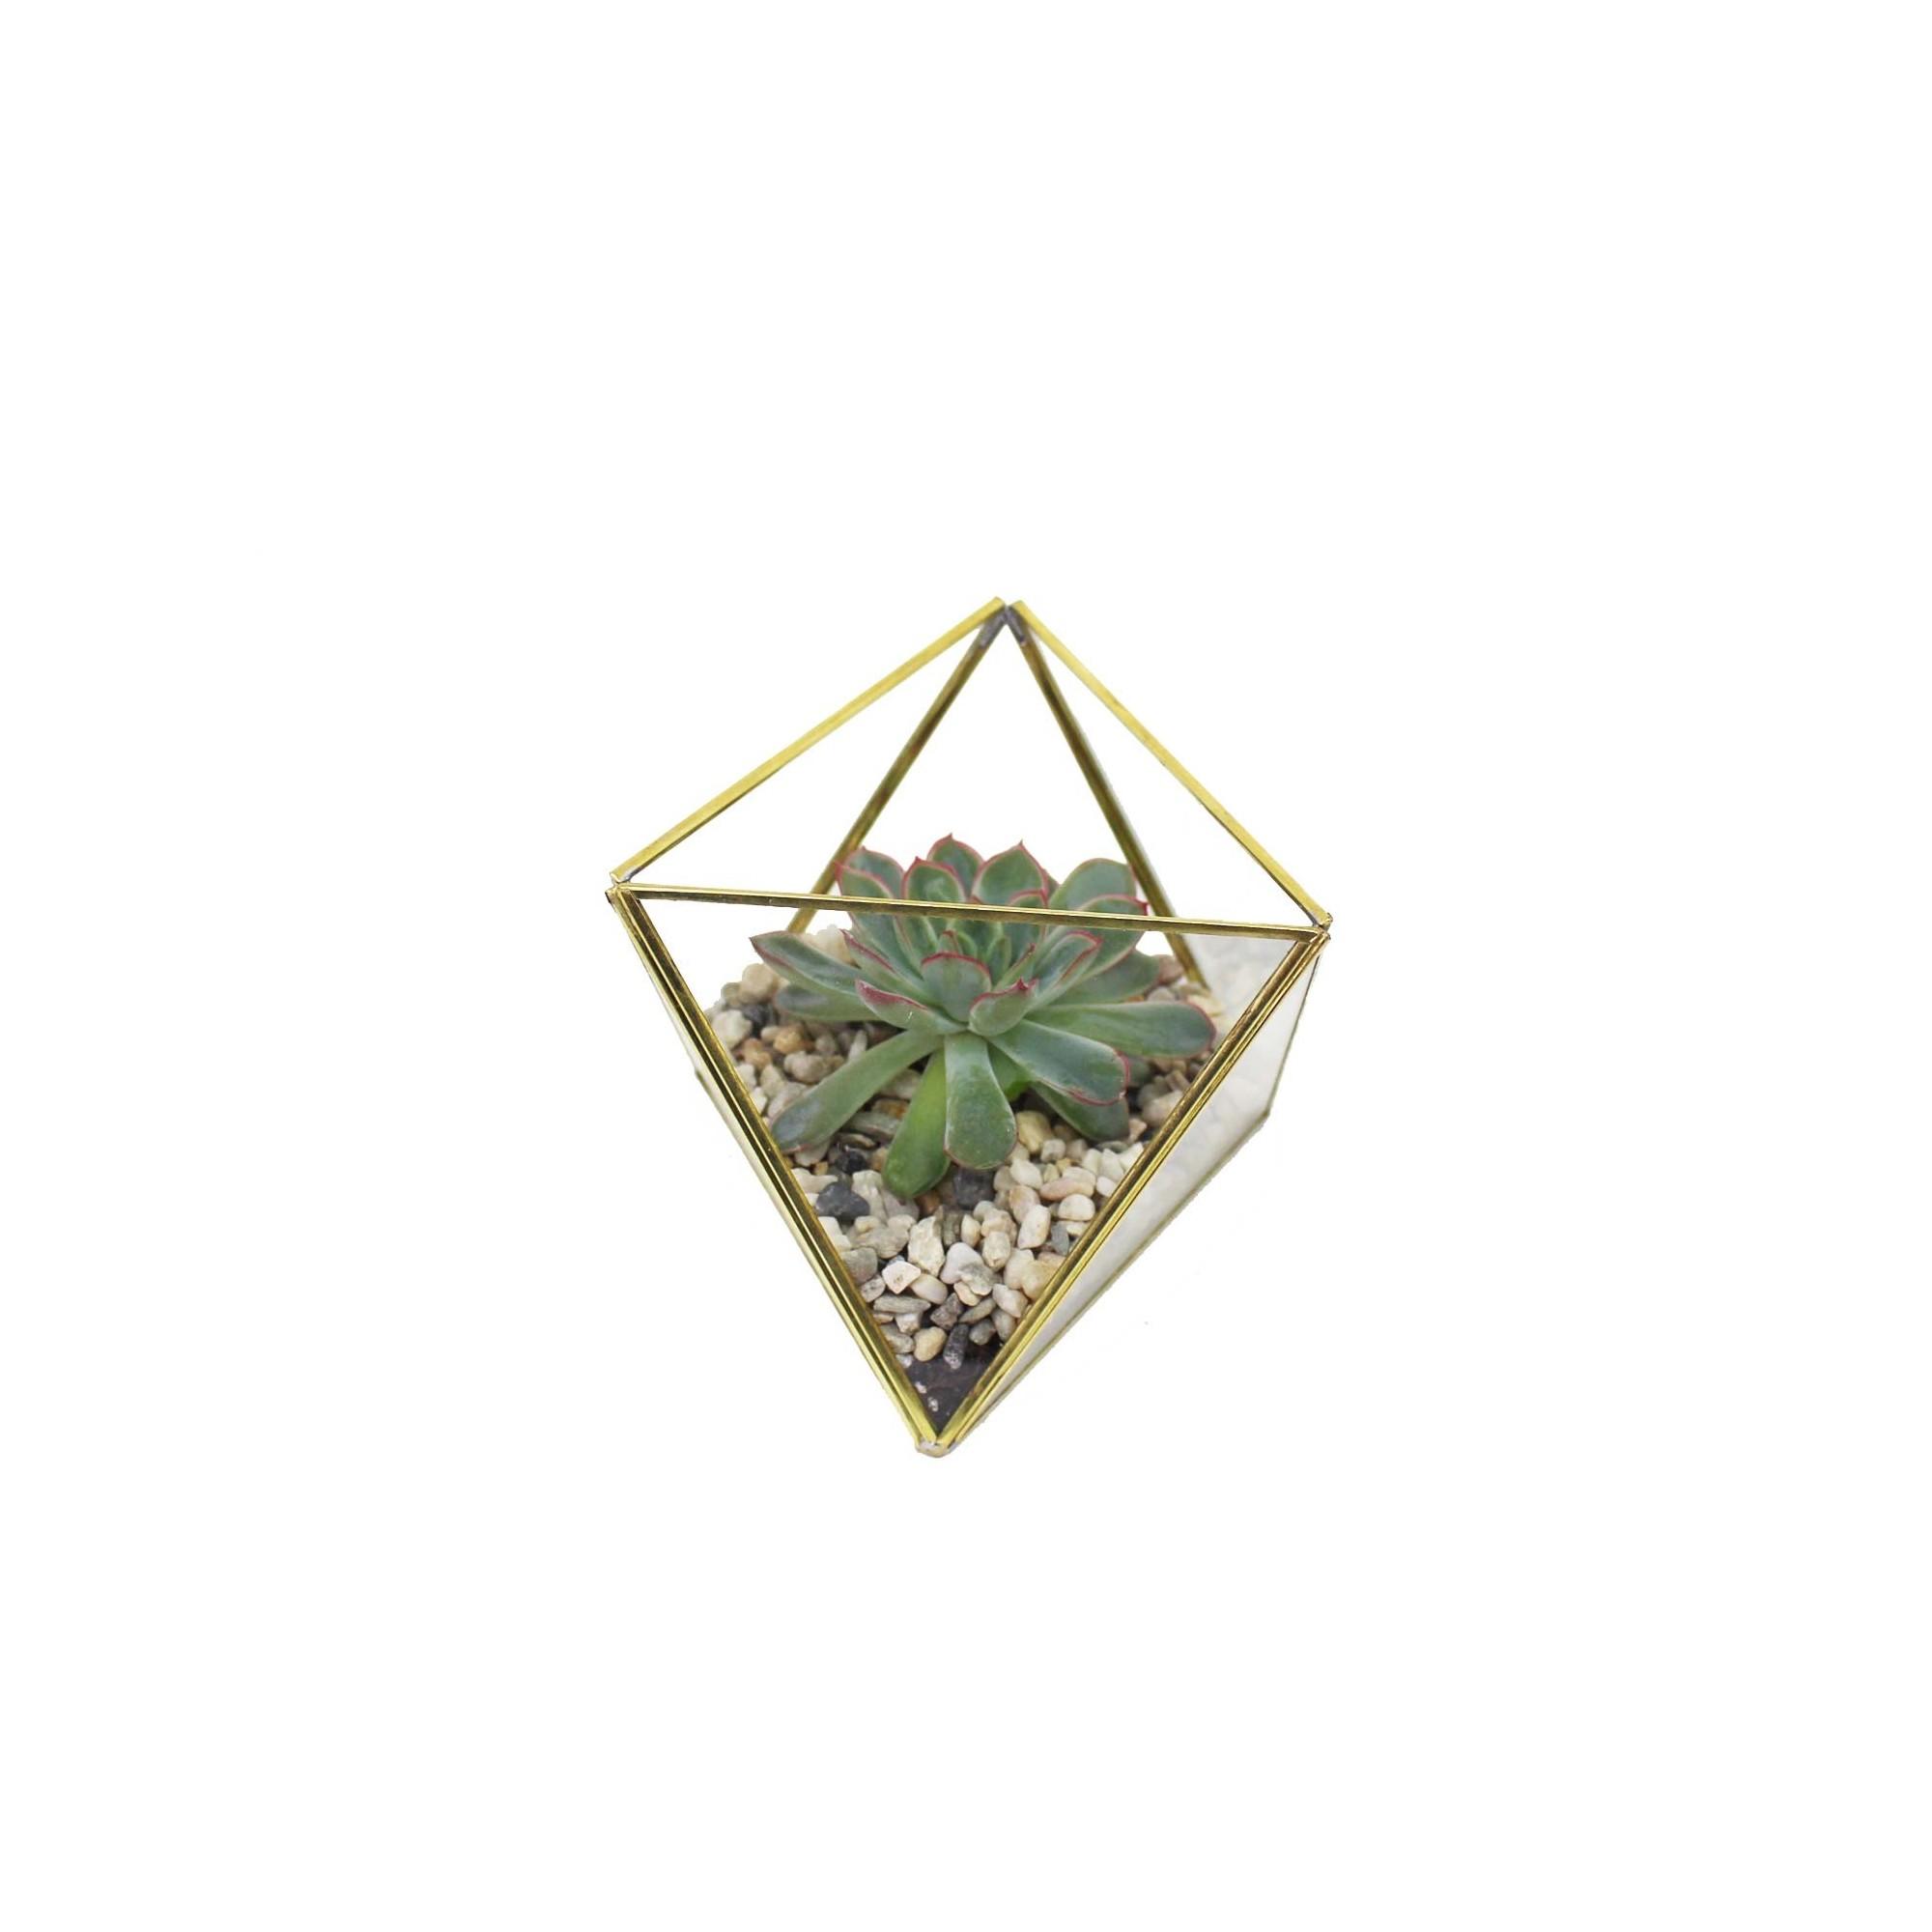 geometrisches terrarium aus glas dreiecke mini glas. Black Bedroom Furniture Sets. Home Design Ideas